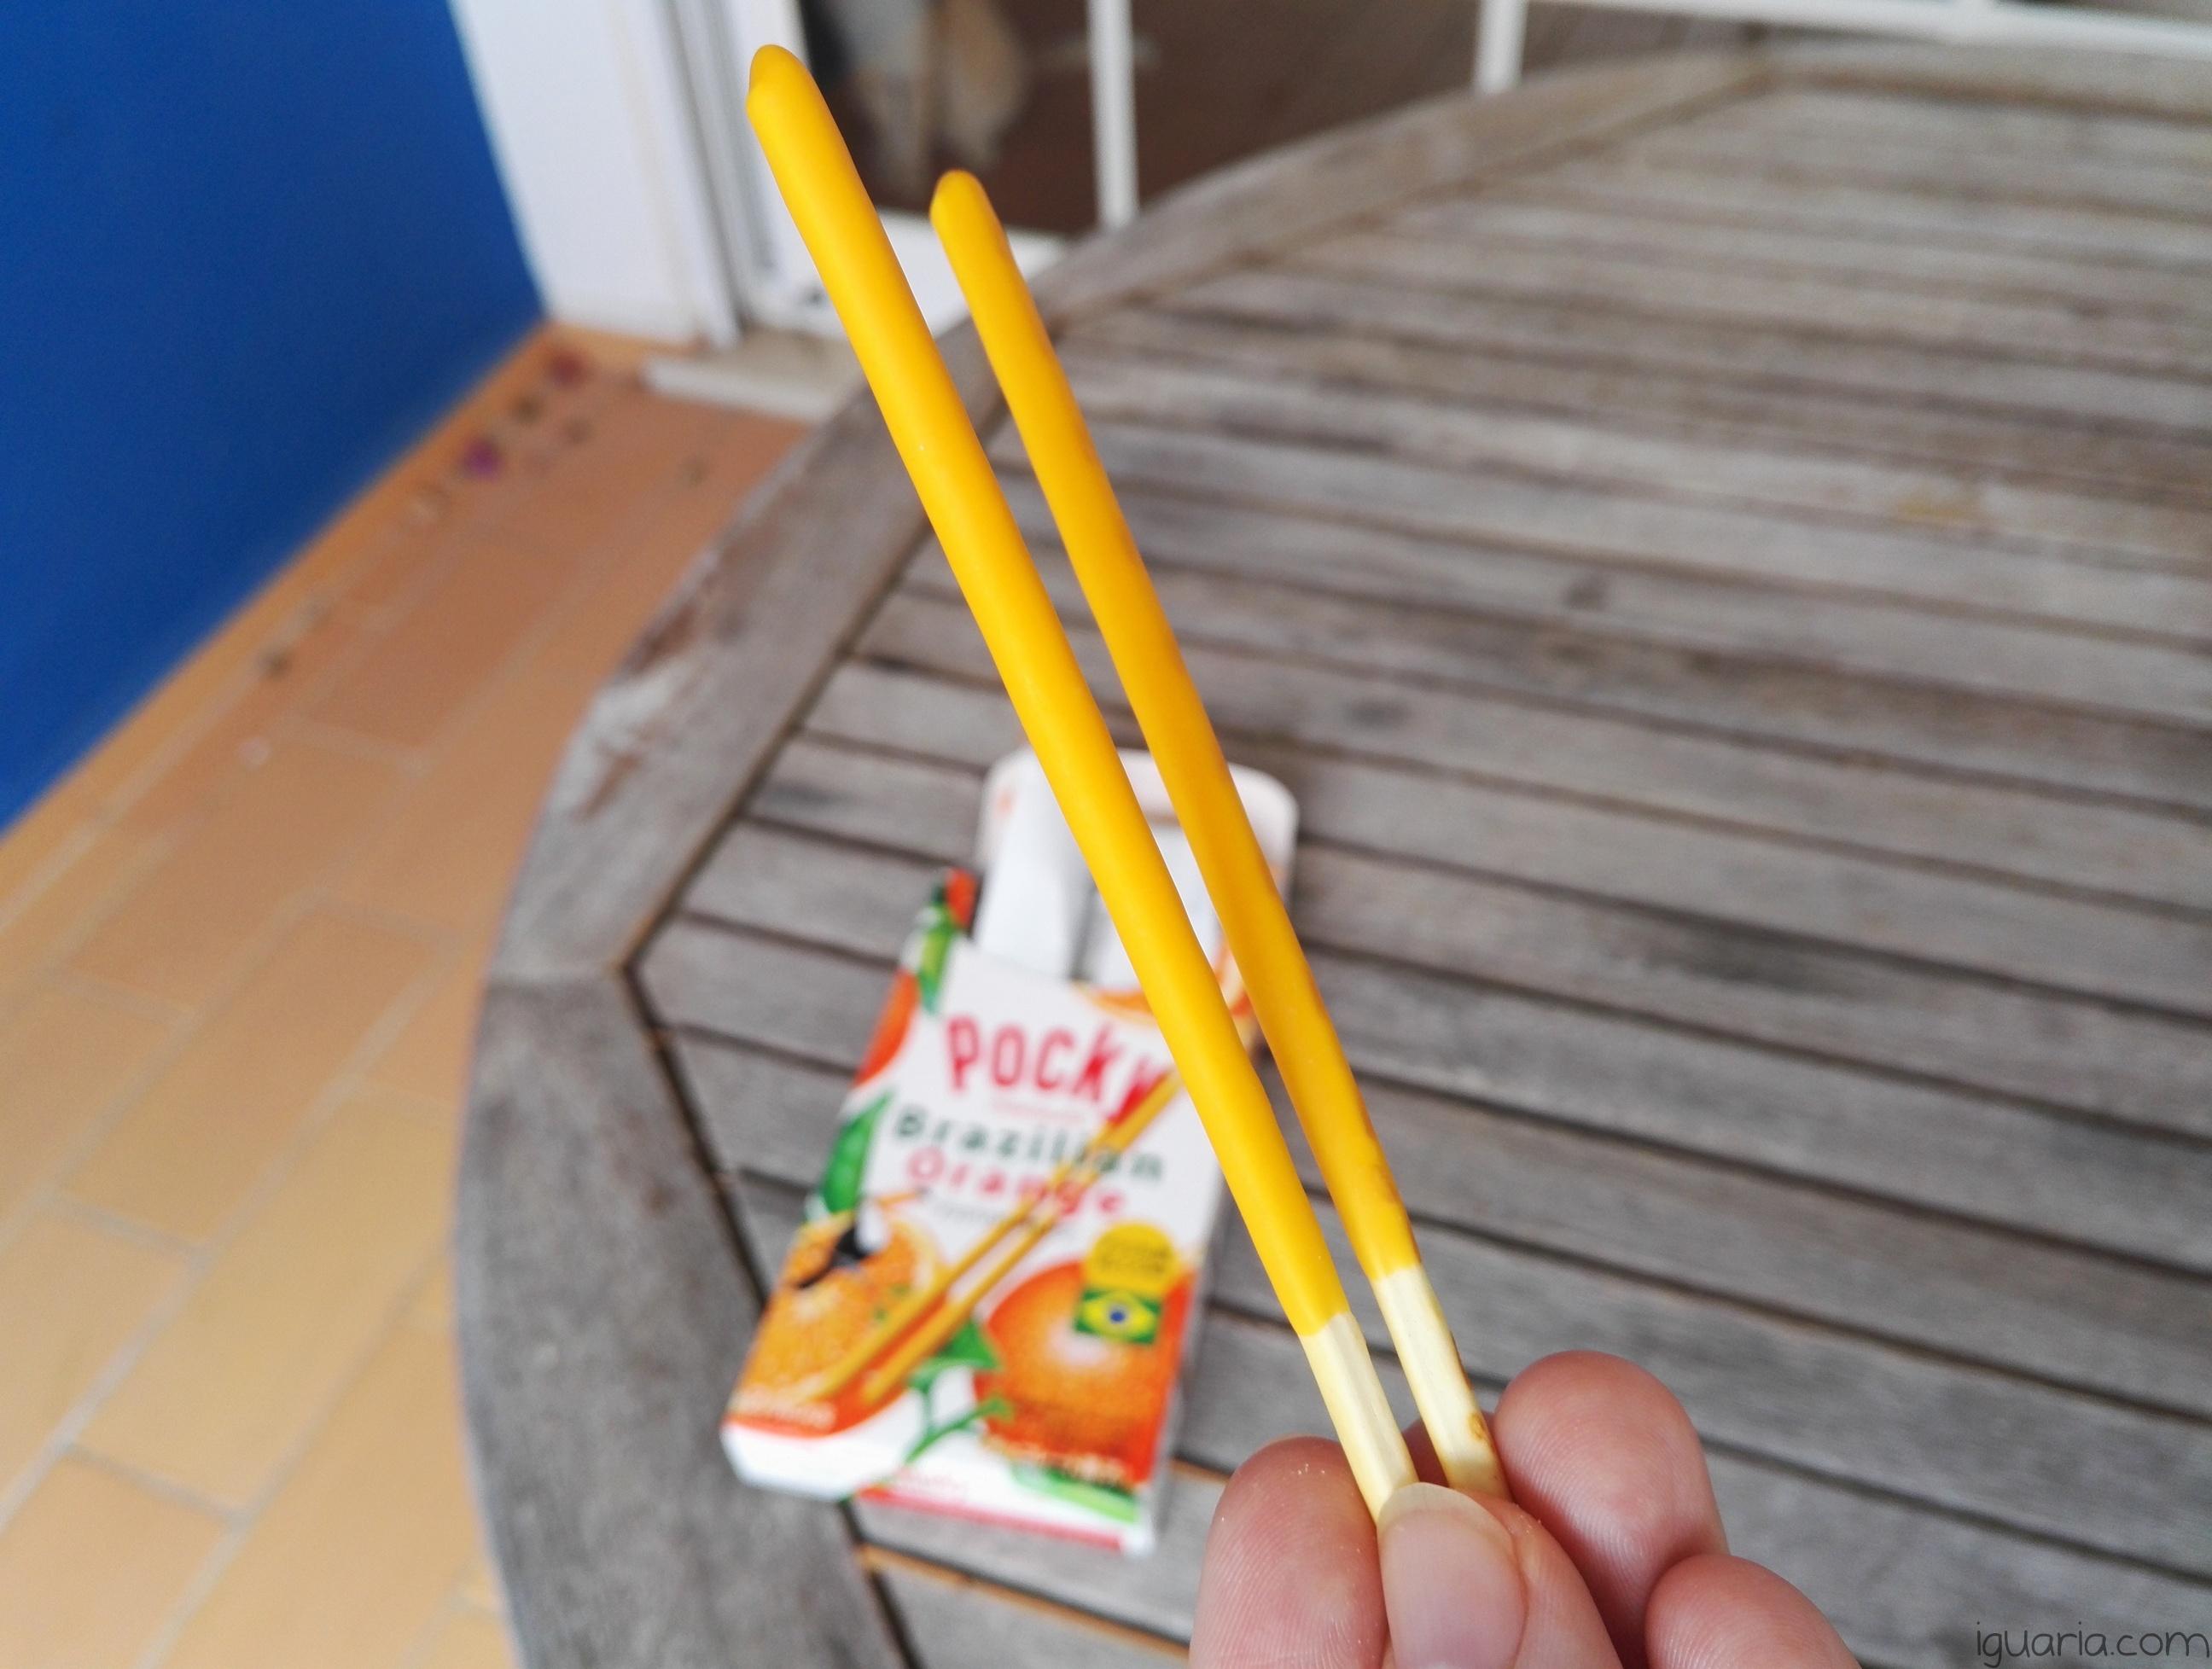 Iguaria_Paus-de-Pocky-Brazilian-Orange